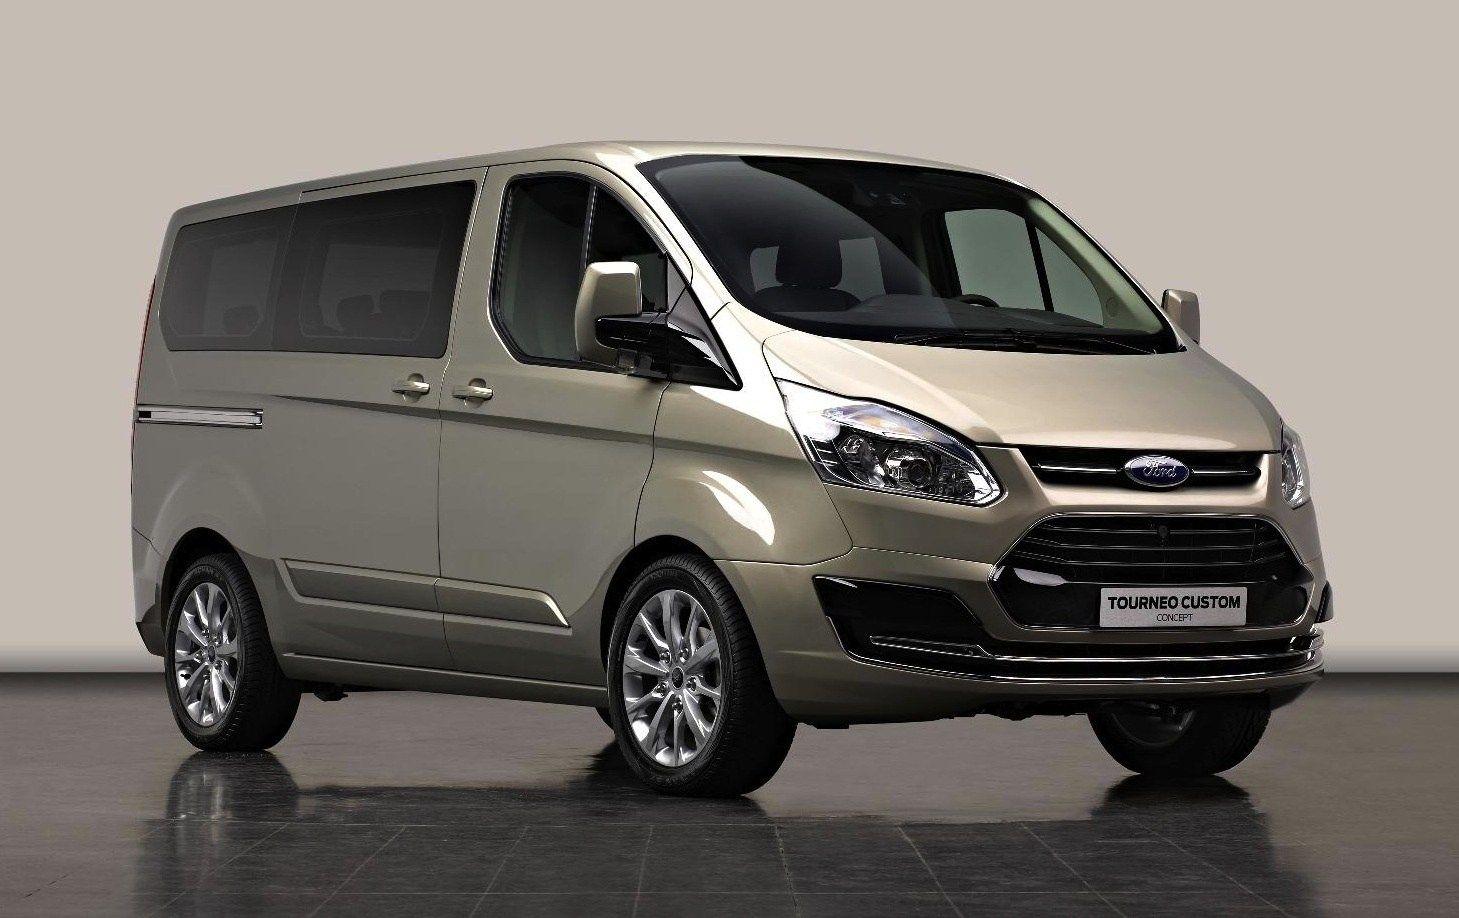 2020 Renault Trafic Spy Shoot Ford Transit Ford Van Transit Custom